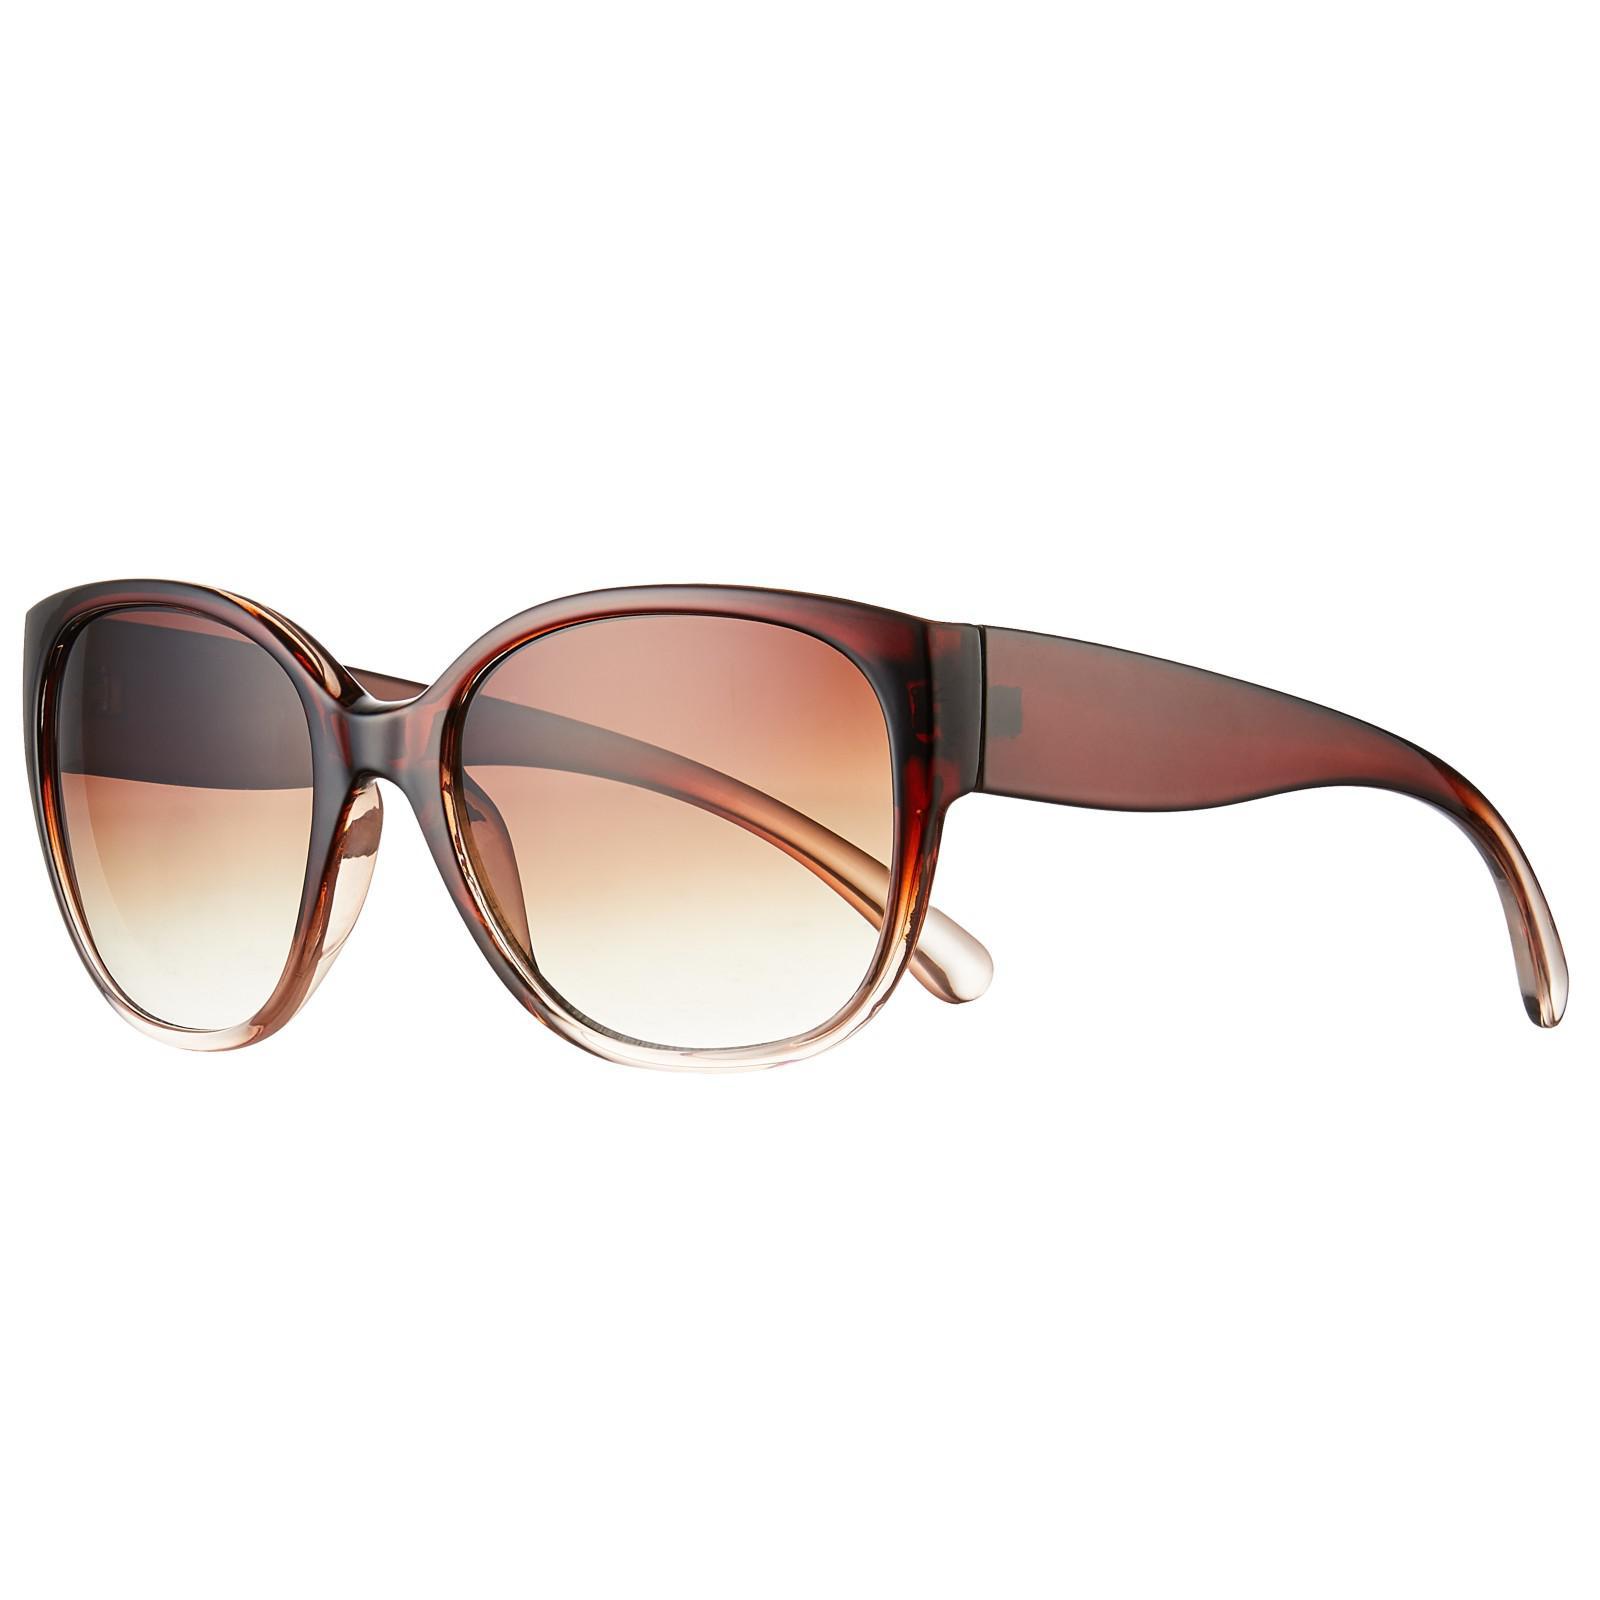 f64733cd56 John Lewis Square Sunglasses in Brown - Lyst